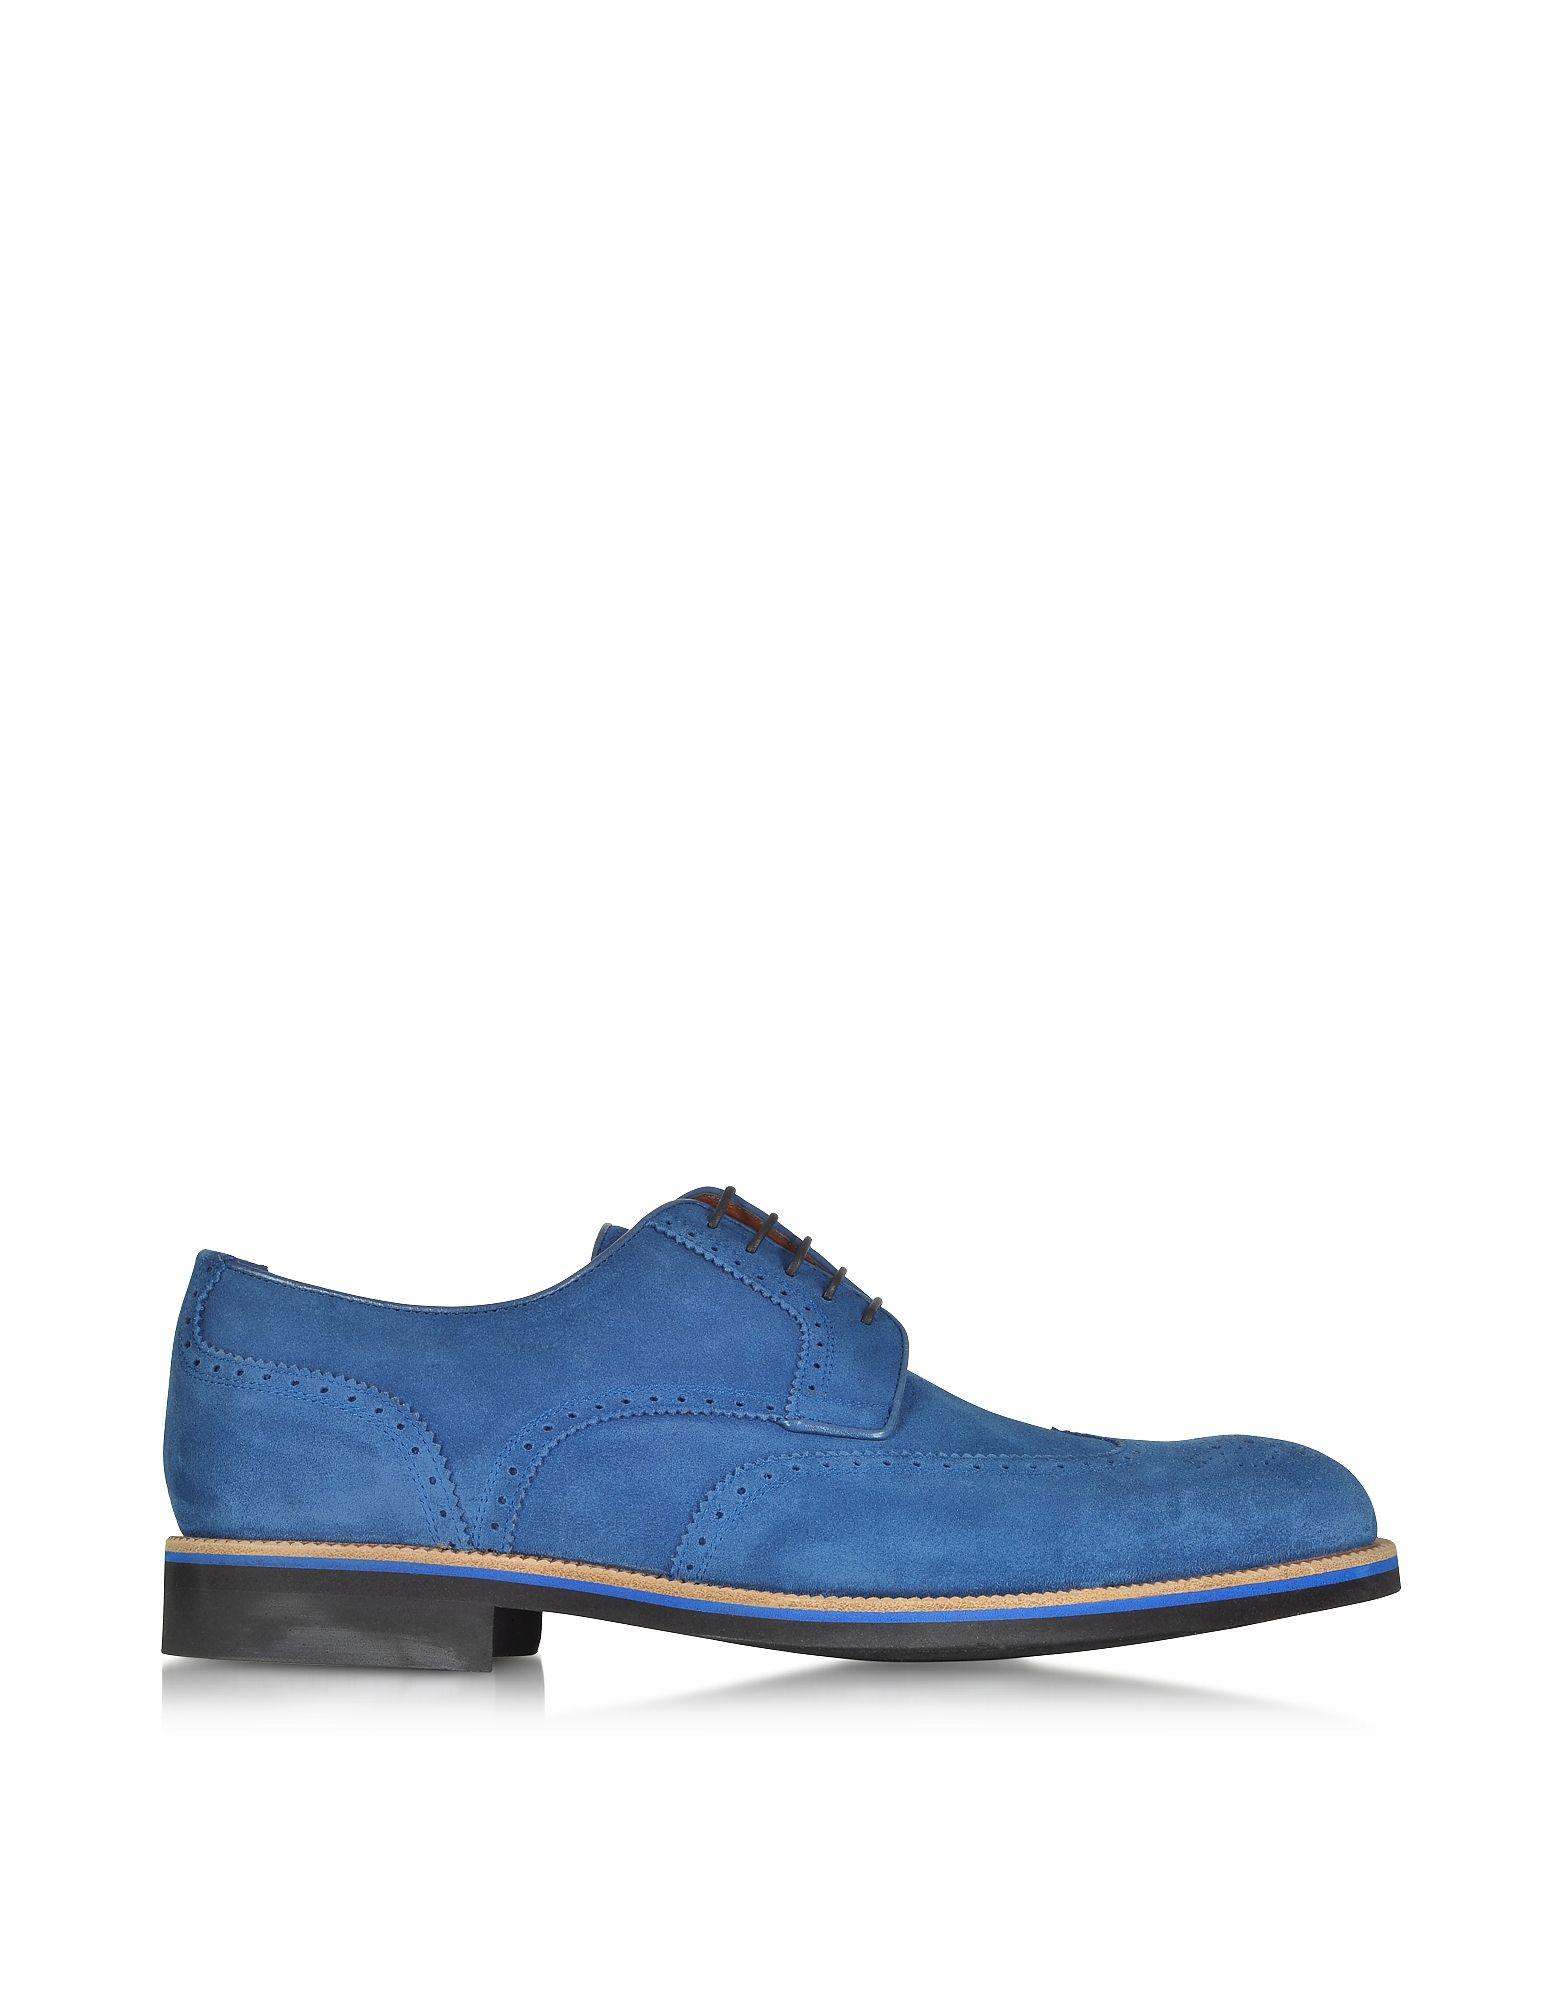 A.TESTONI Men's Suede Derby Shoes 4AoiIPM0